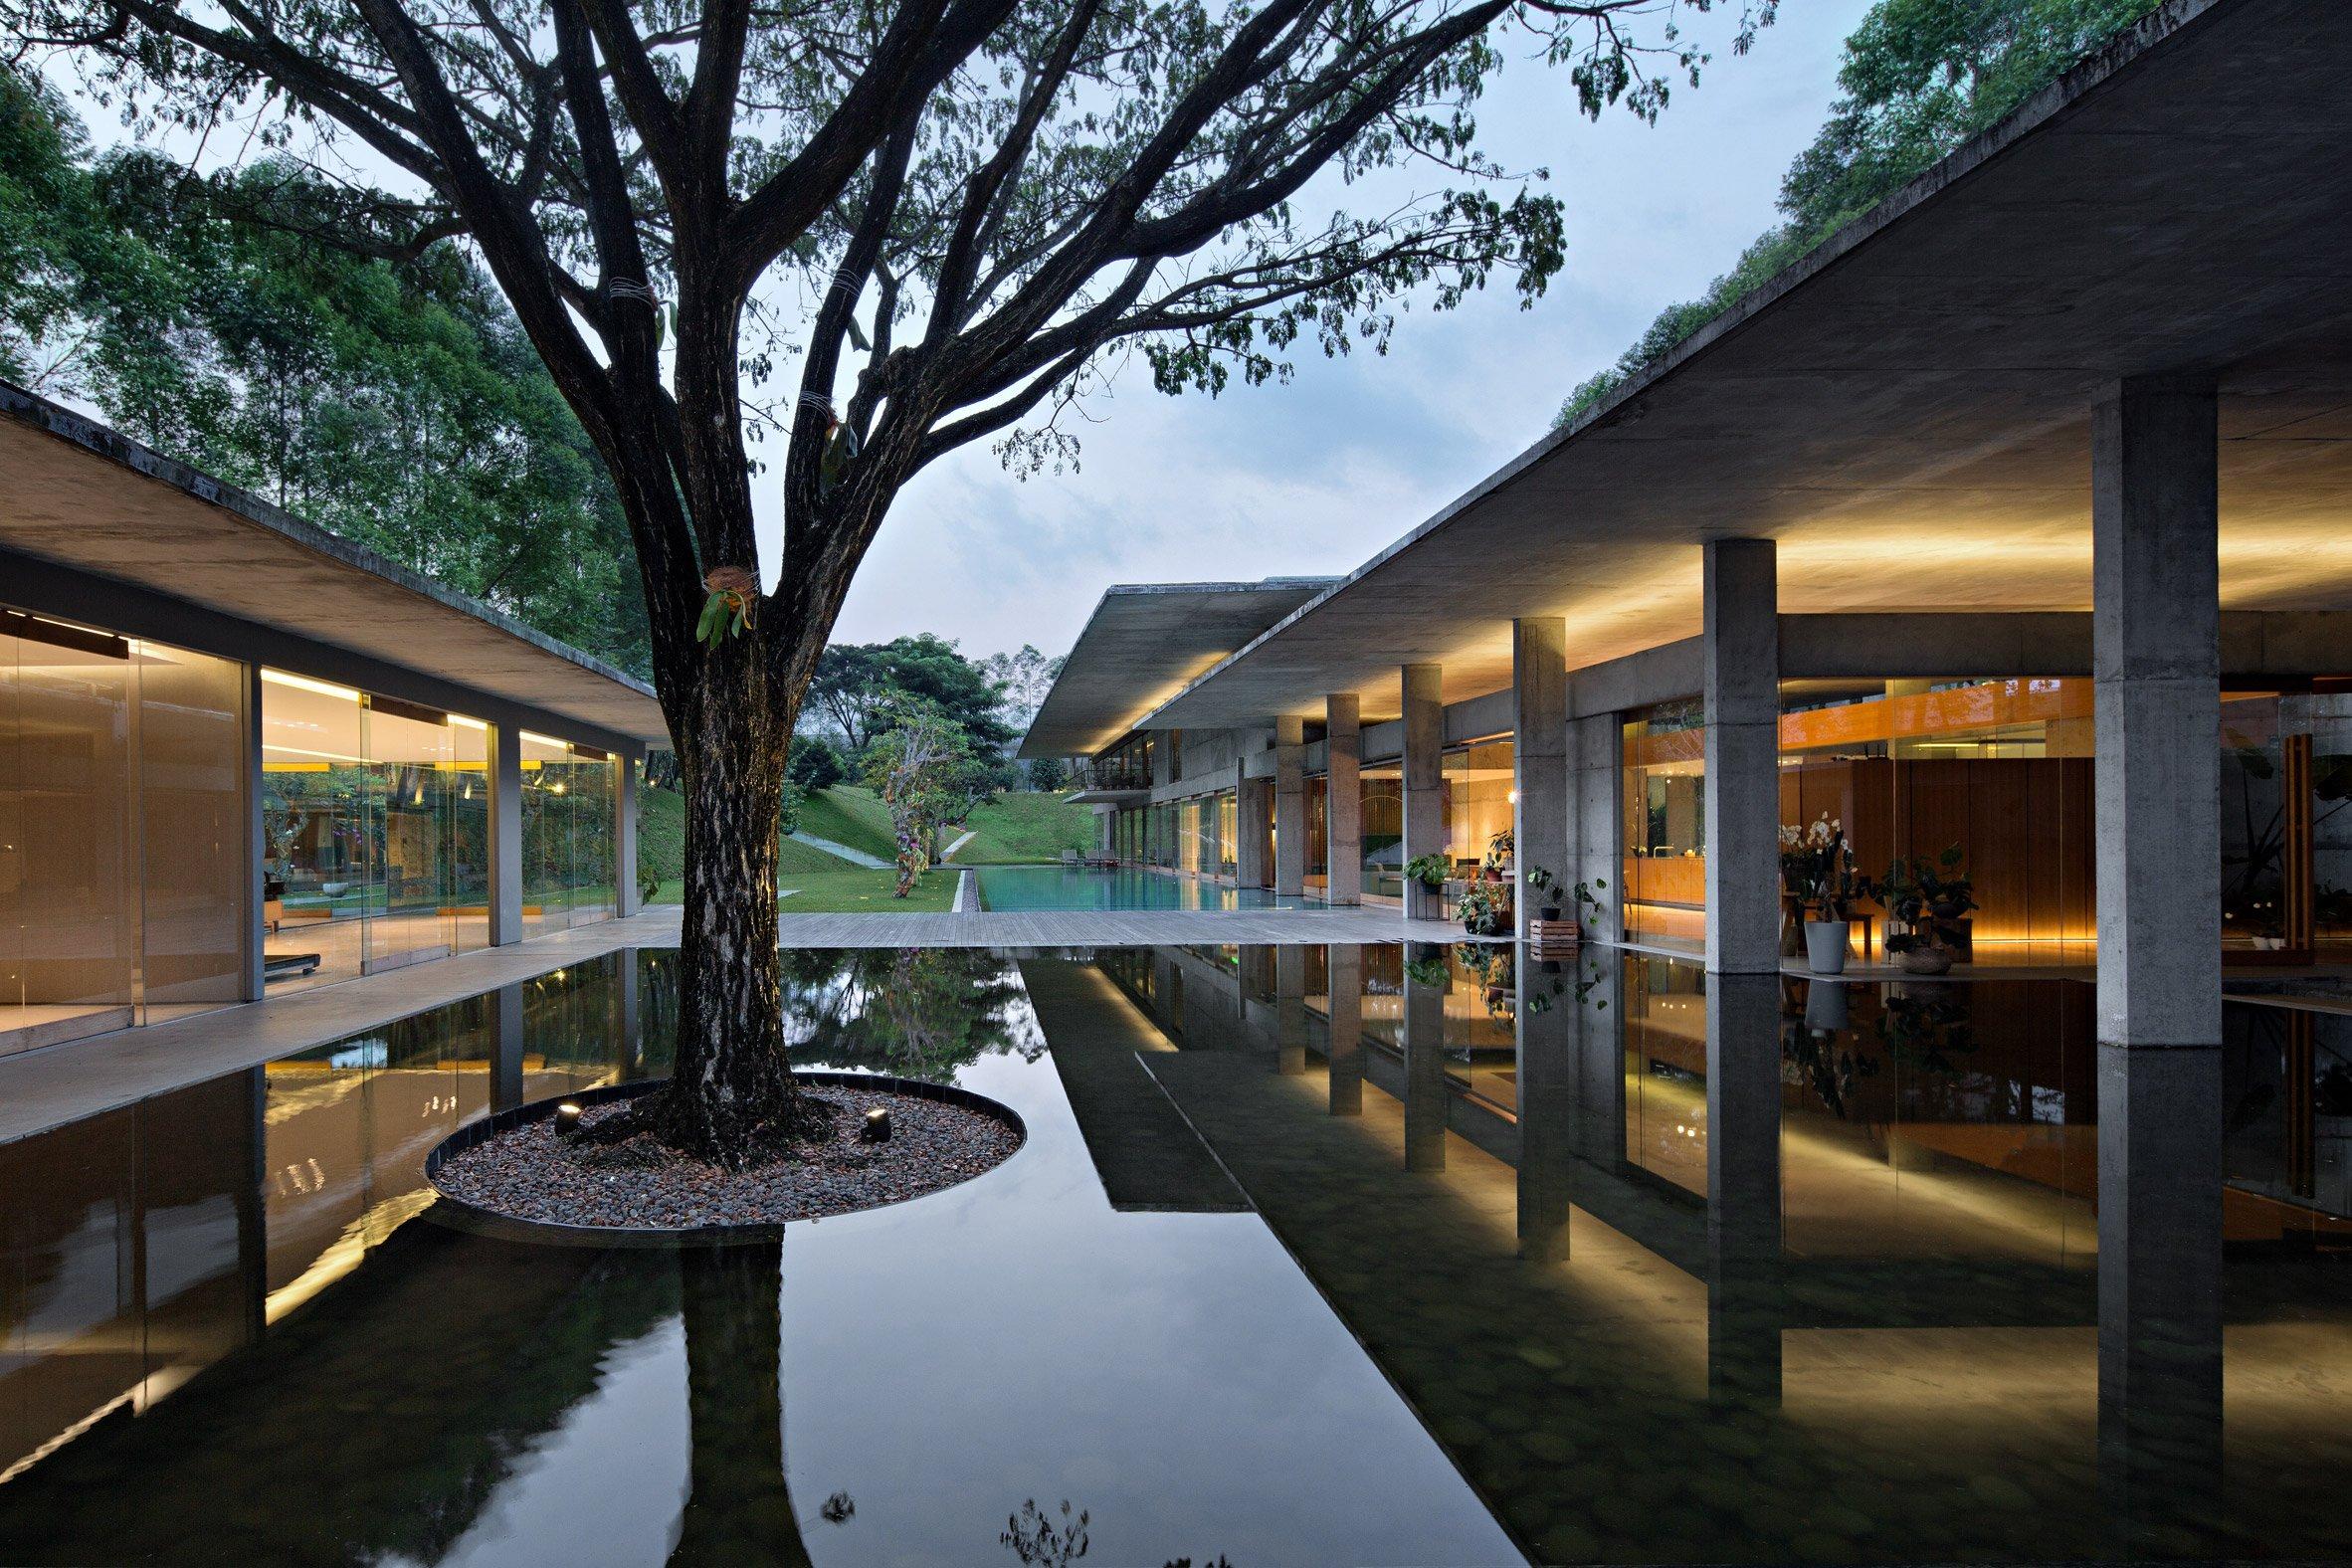 Concrete house in Indonesia